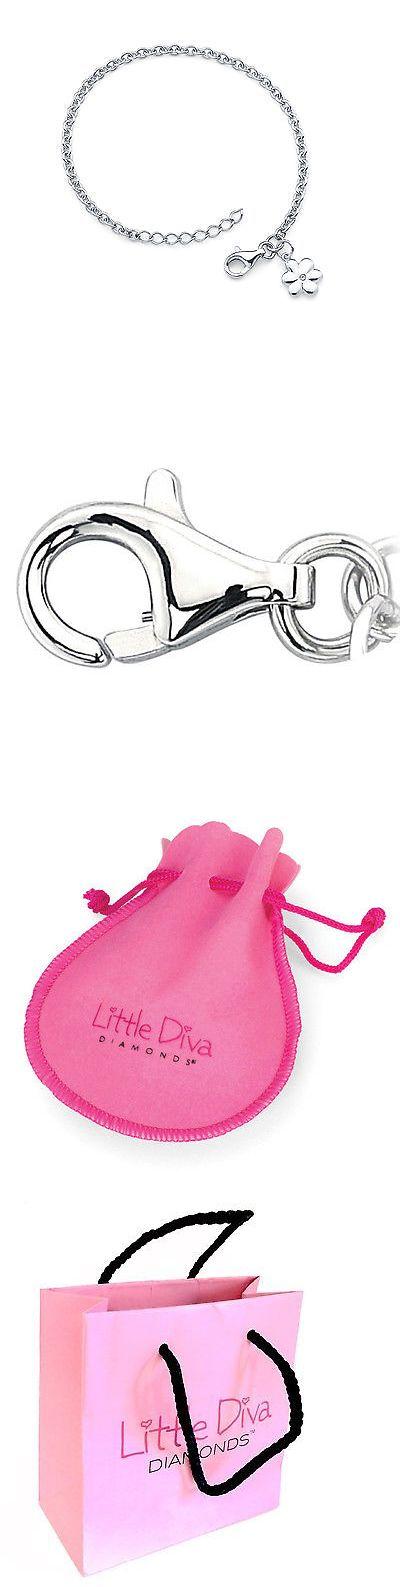 Bracelets 84606: Little Diva Diamonds Silver Childrens Diamond Accent Flower Bracelet -> BUY IT NOW ONLY: $64.68 on eBay!